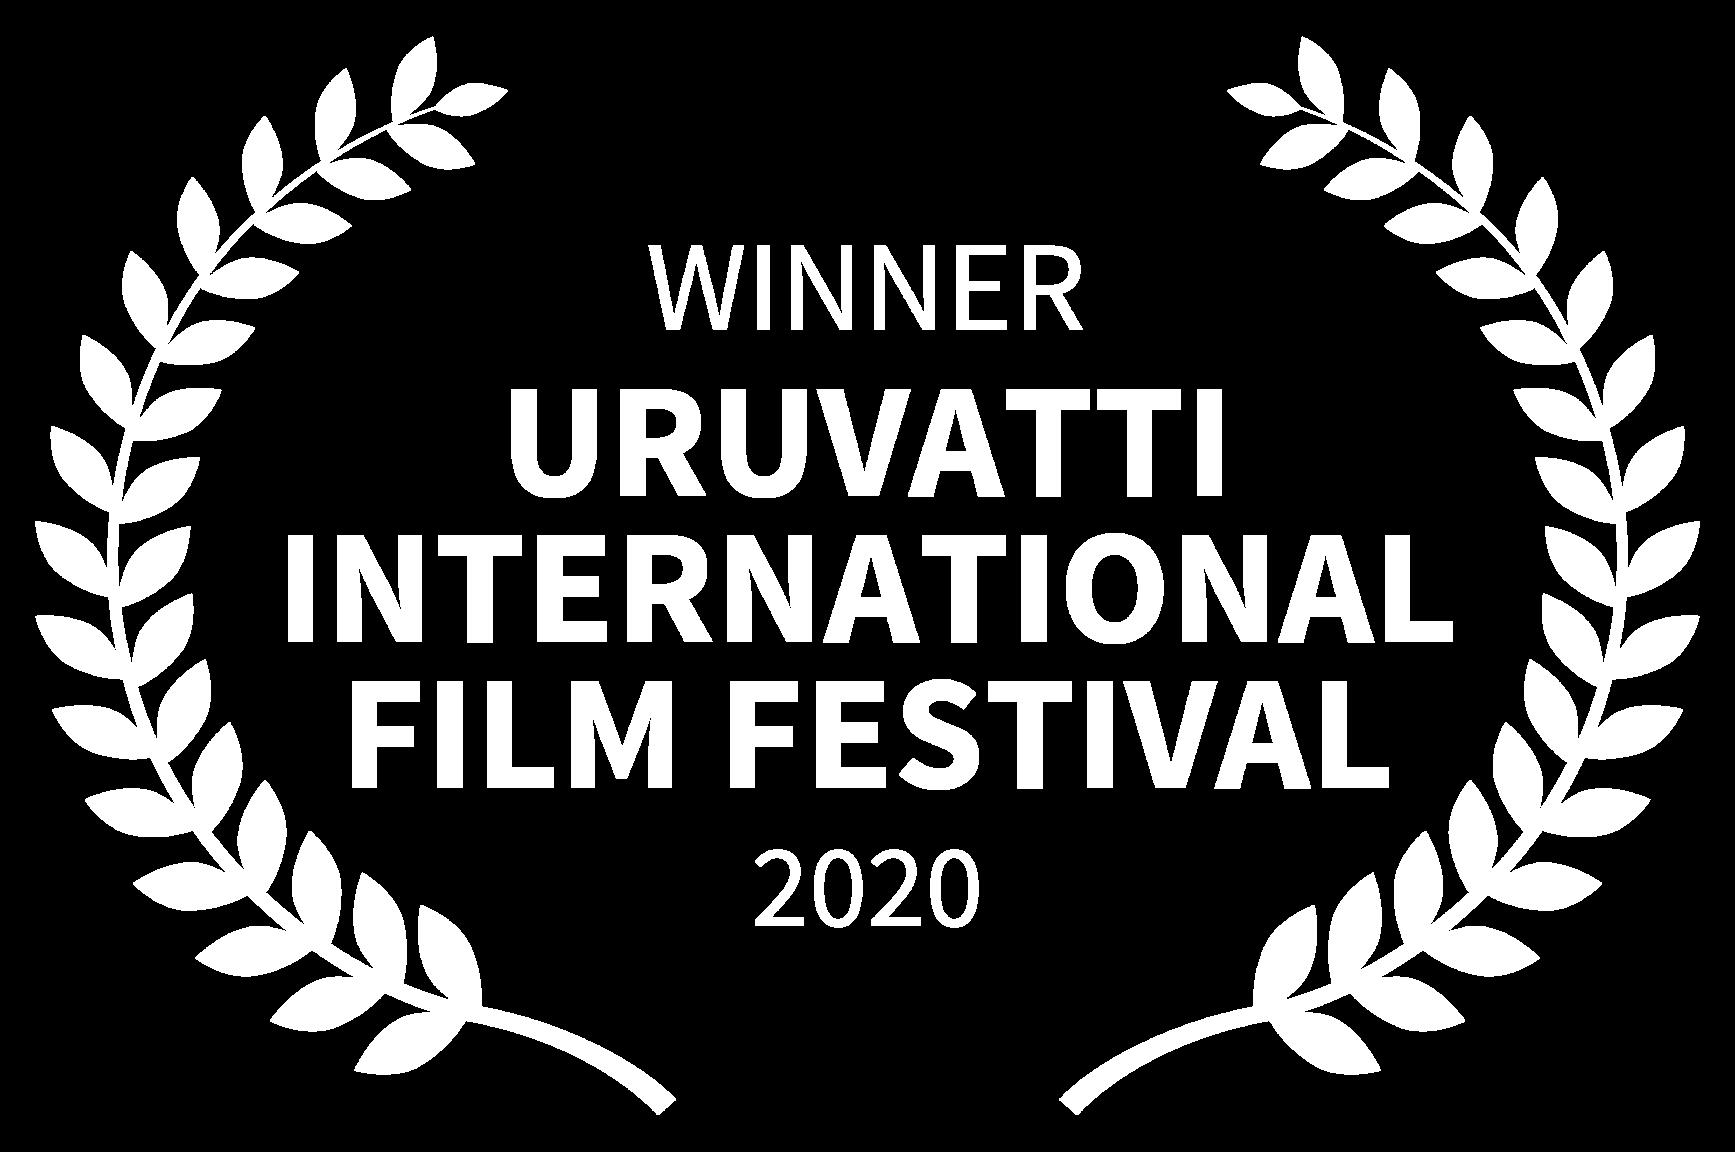 WINNER - URUVATTI INTERNATIONAL FILM FESTIVAL - 2020